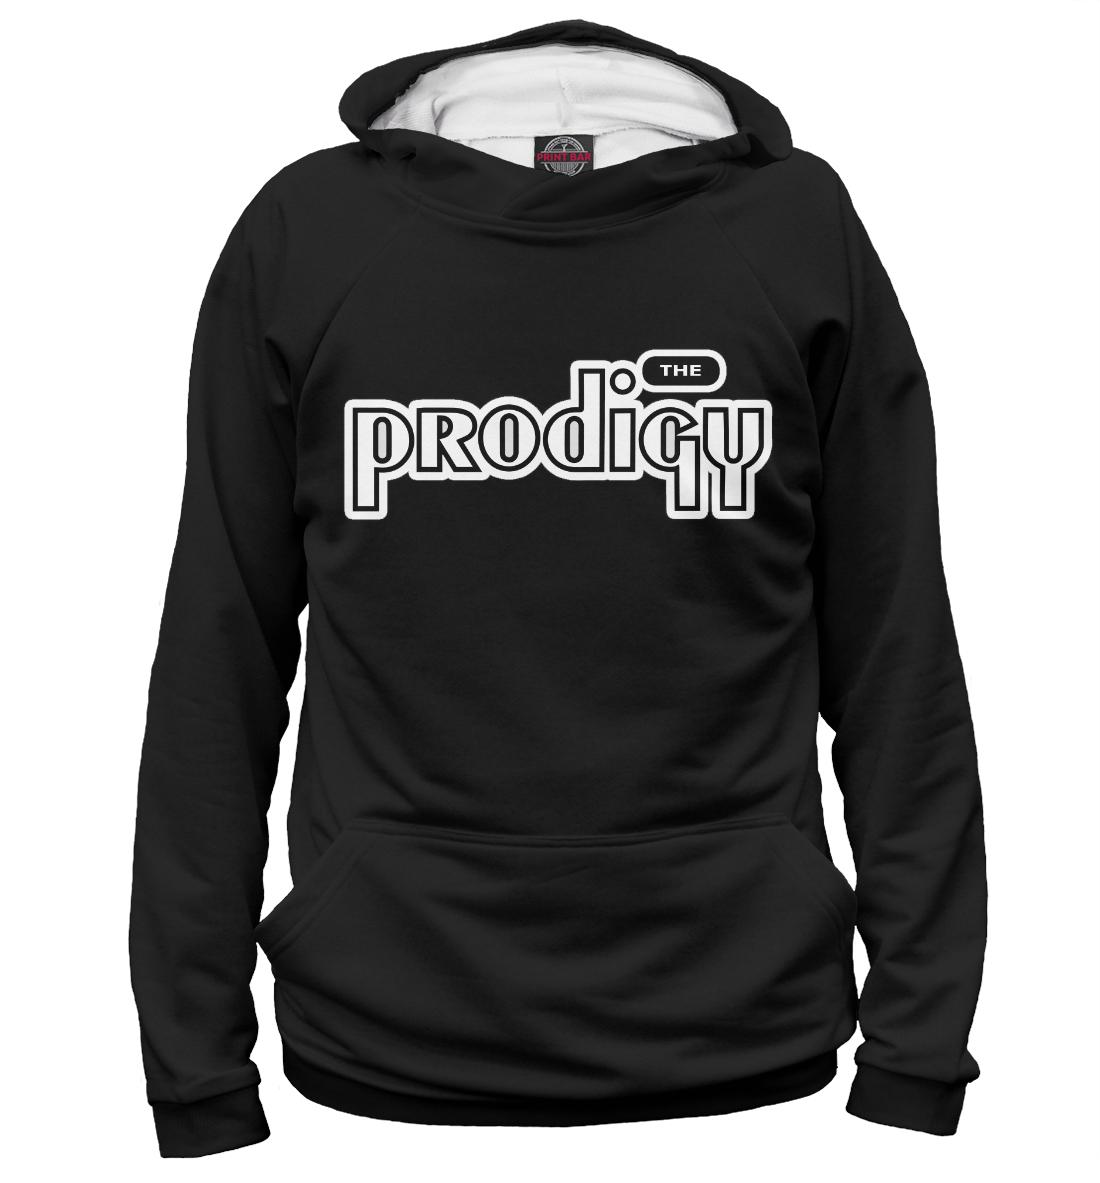 Купить The Prodigy, Printbar, Худи, THE-824776-hud-1